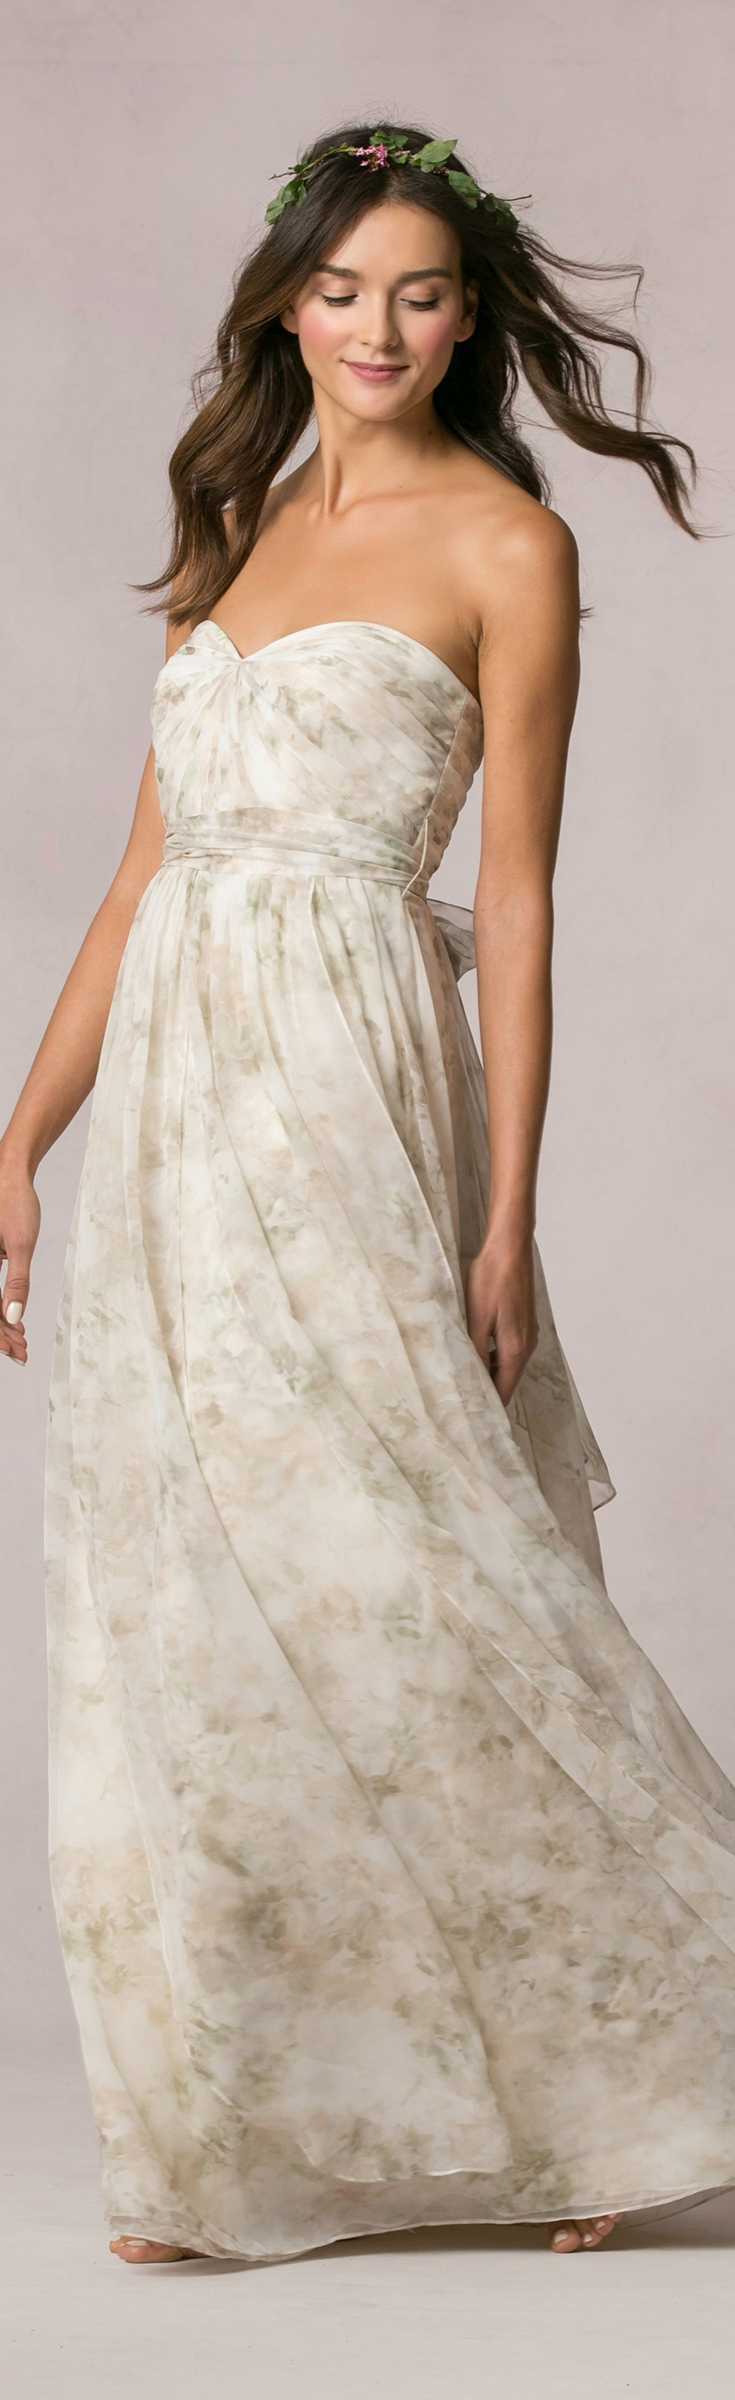 Jenny yoo bridesmaid dresses chic stylish weddings jenny yoo bridesmaid dresses showshopthepostwidget id1695331 ombrellifo Choice Image